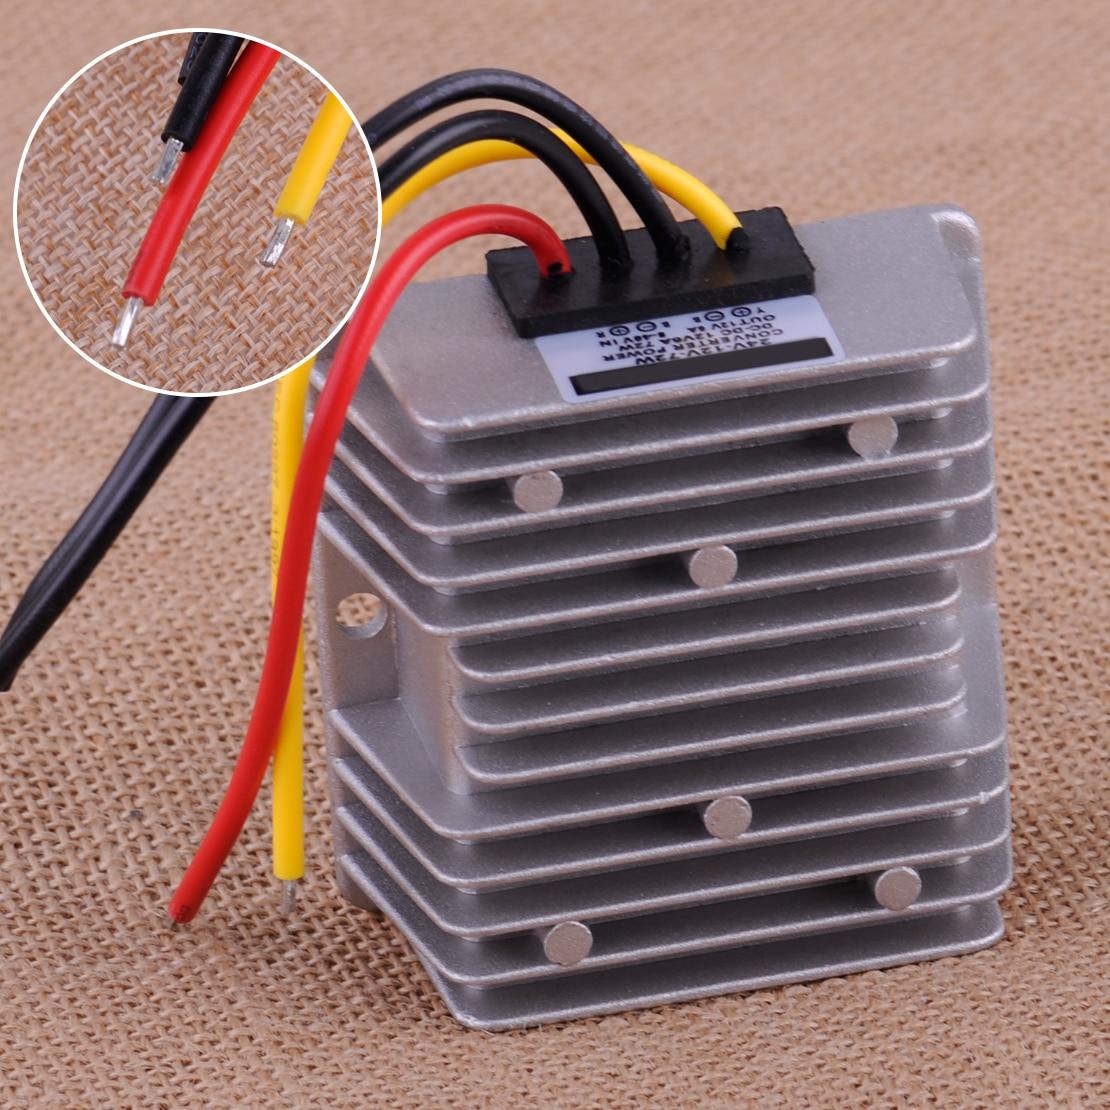 CITALL DC Voltage Stabilizer 8-40V to 12V 6A 72W Power Supply Converter Regulator Waterproof Dustproof Shockproof